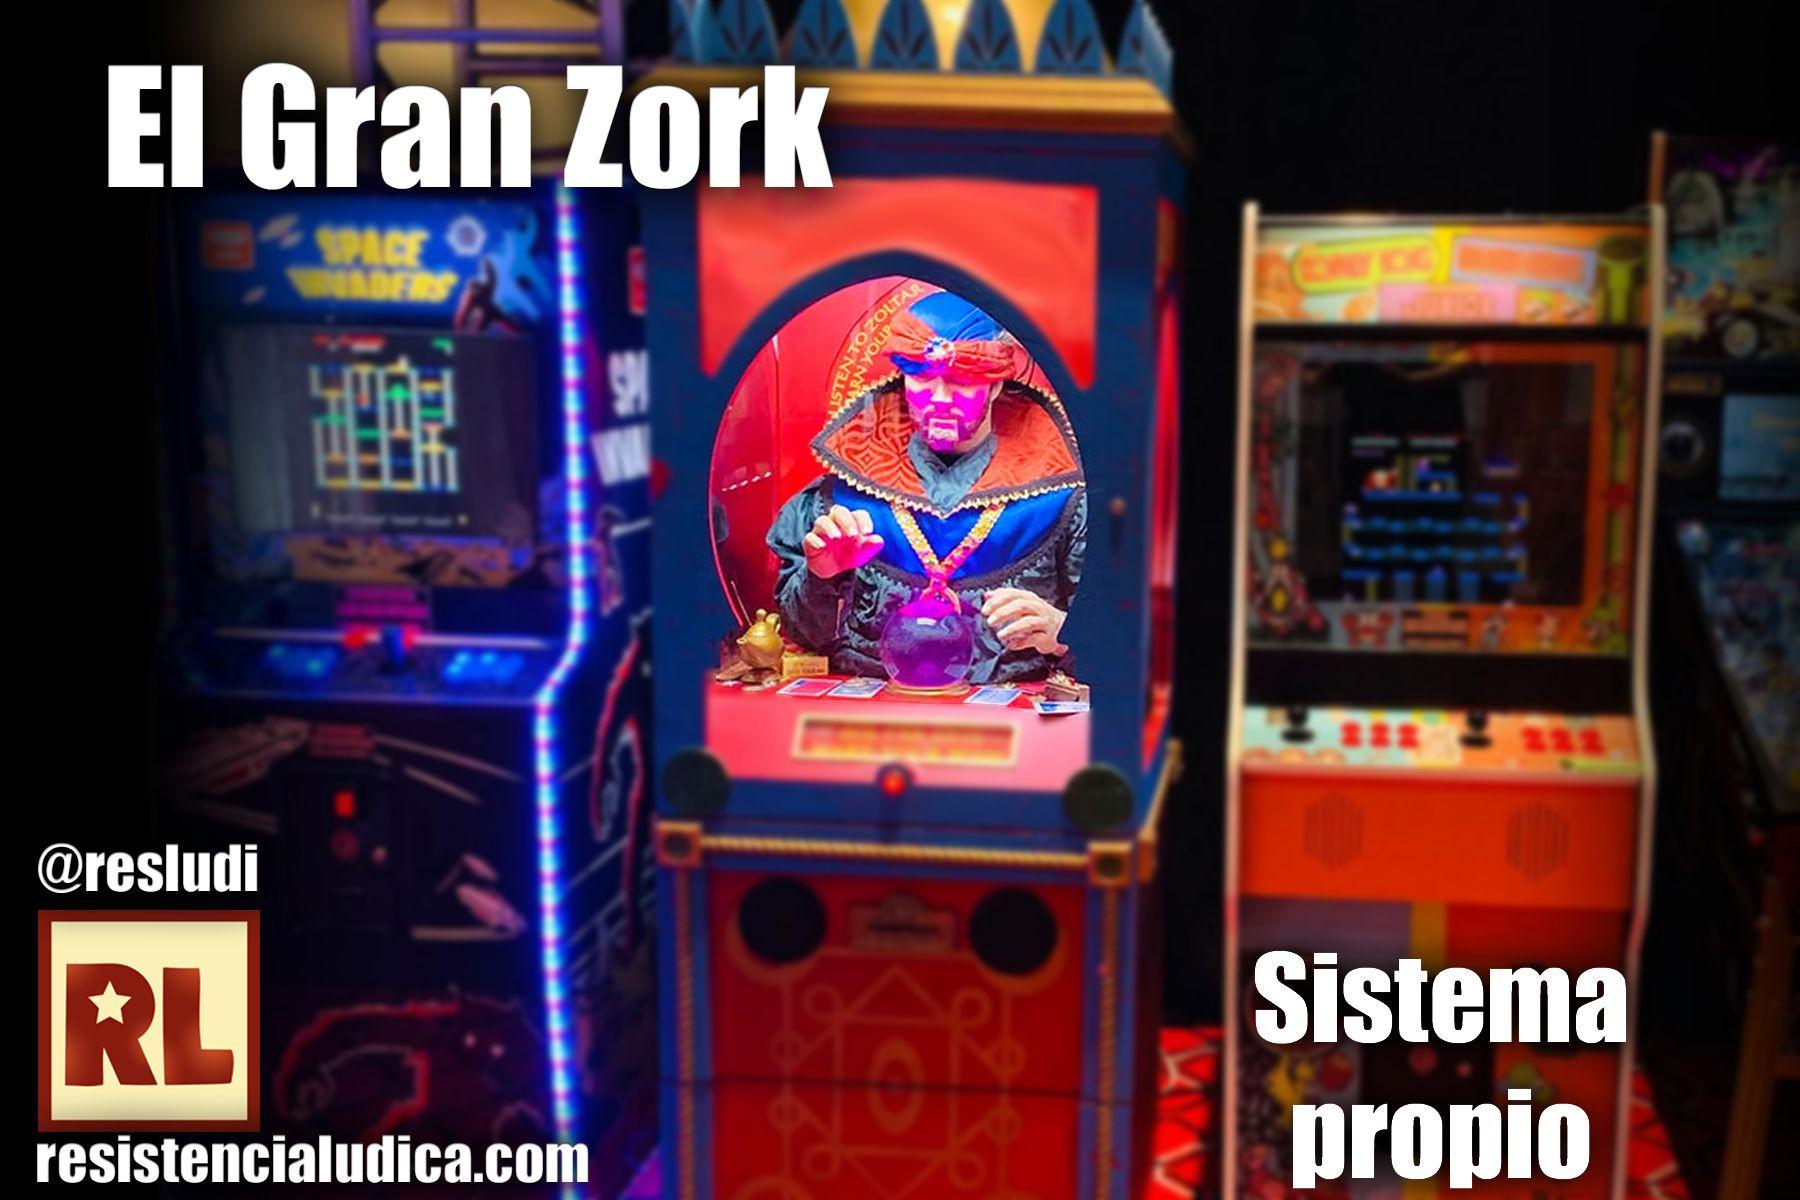 Rol - El Gran Zork (Sistema propio) RL